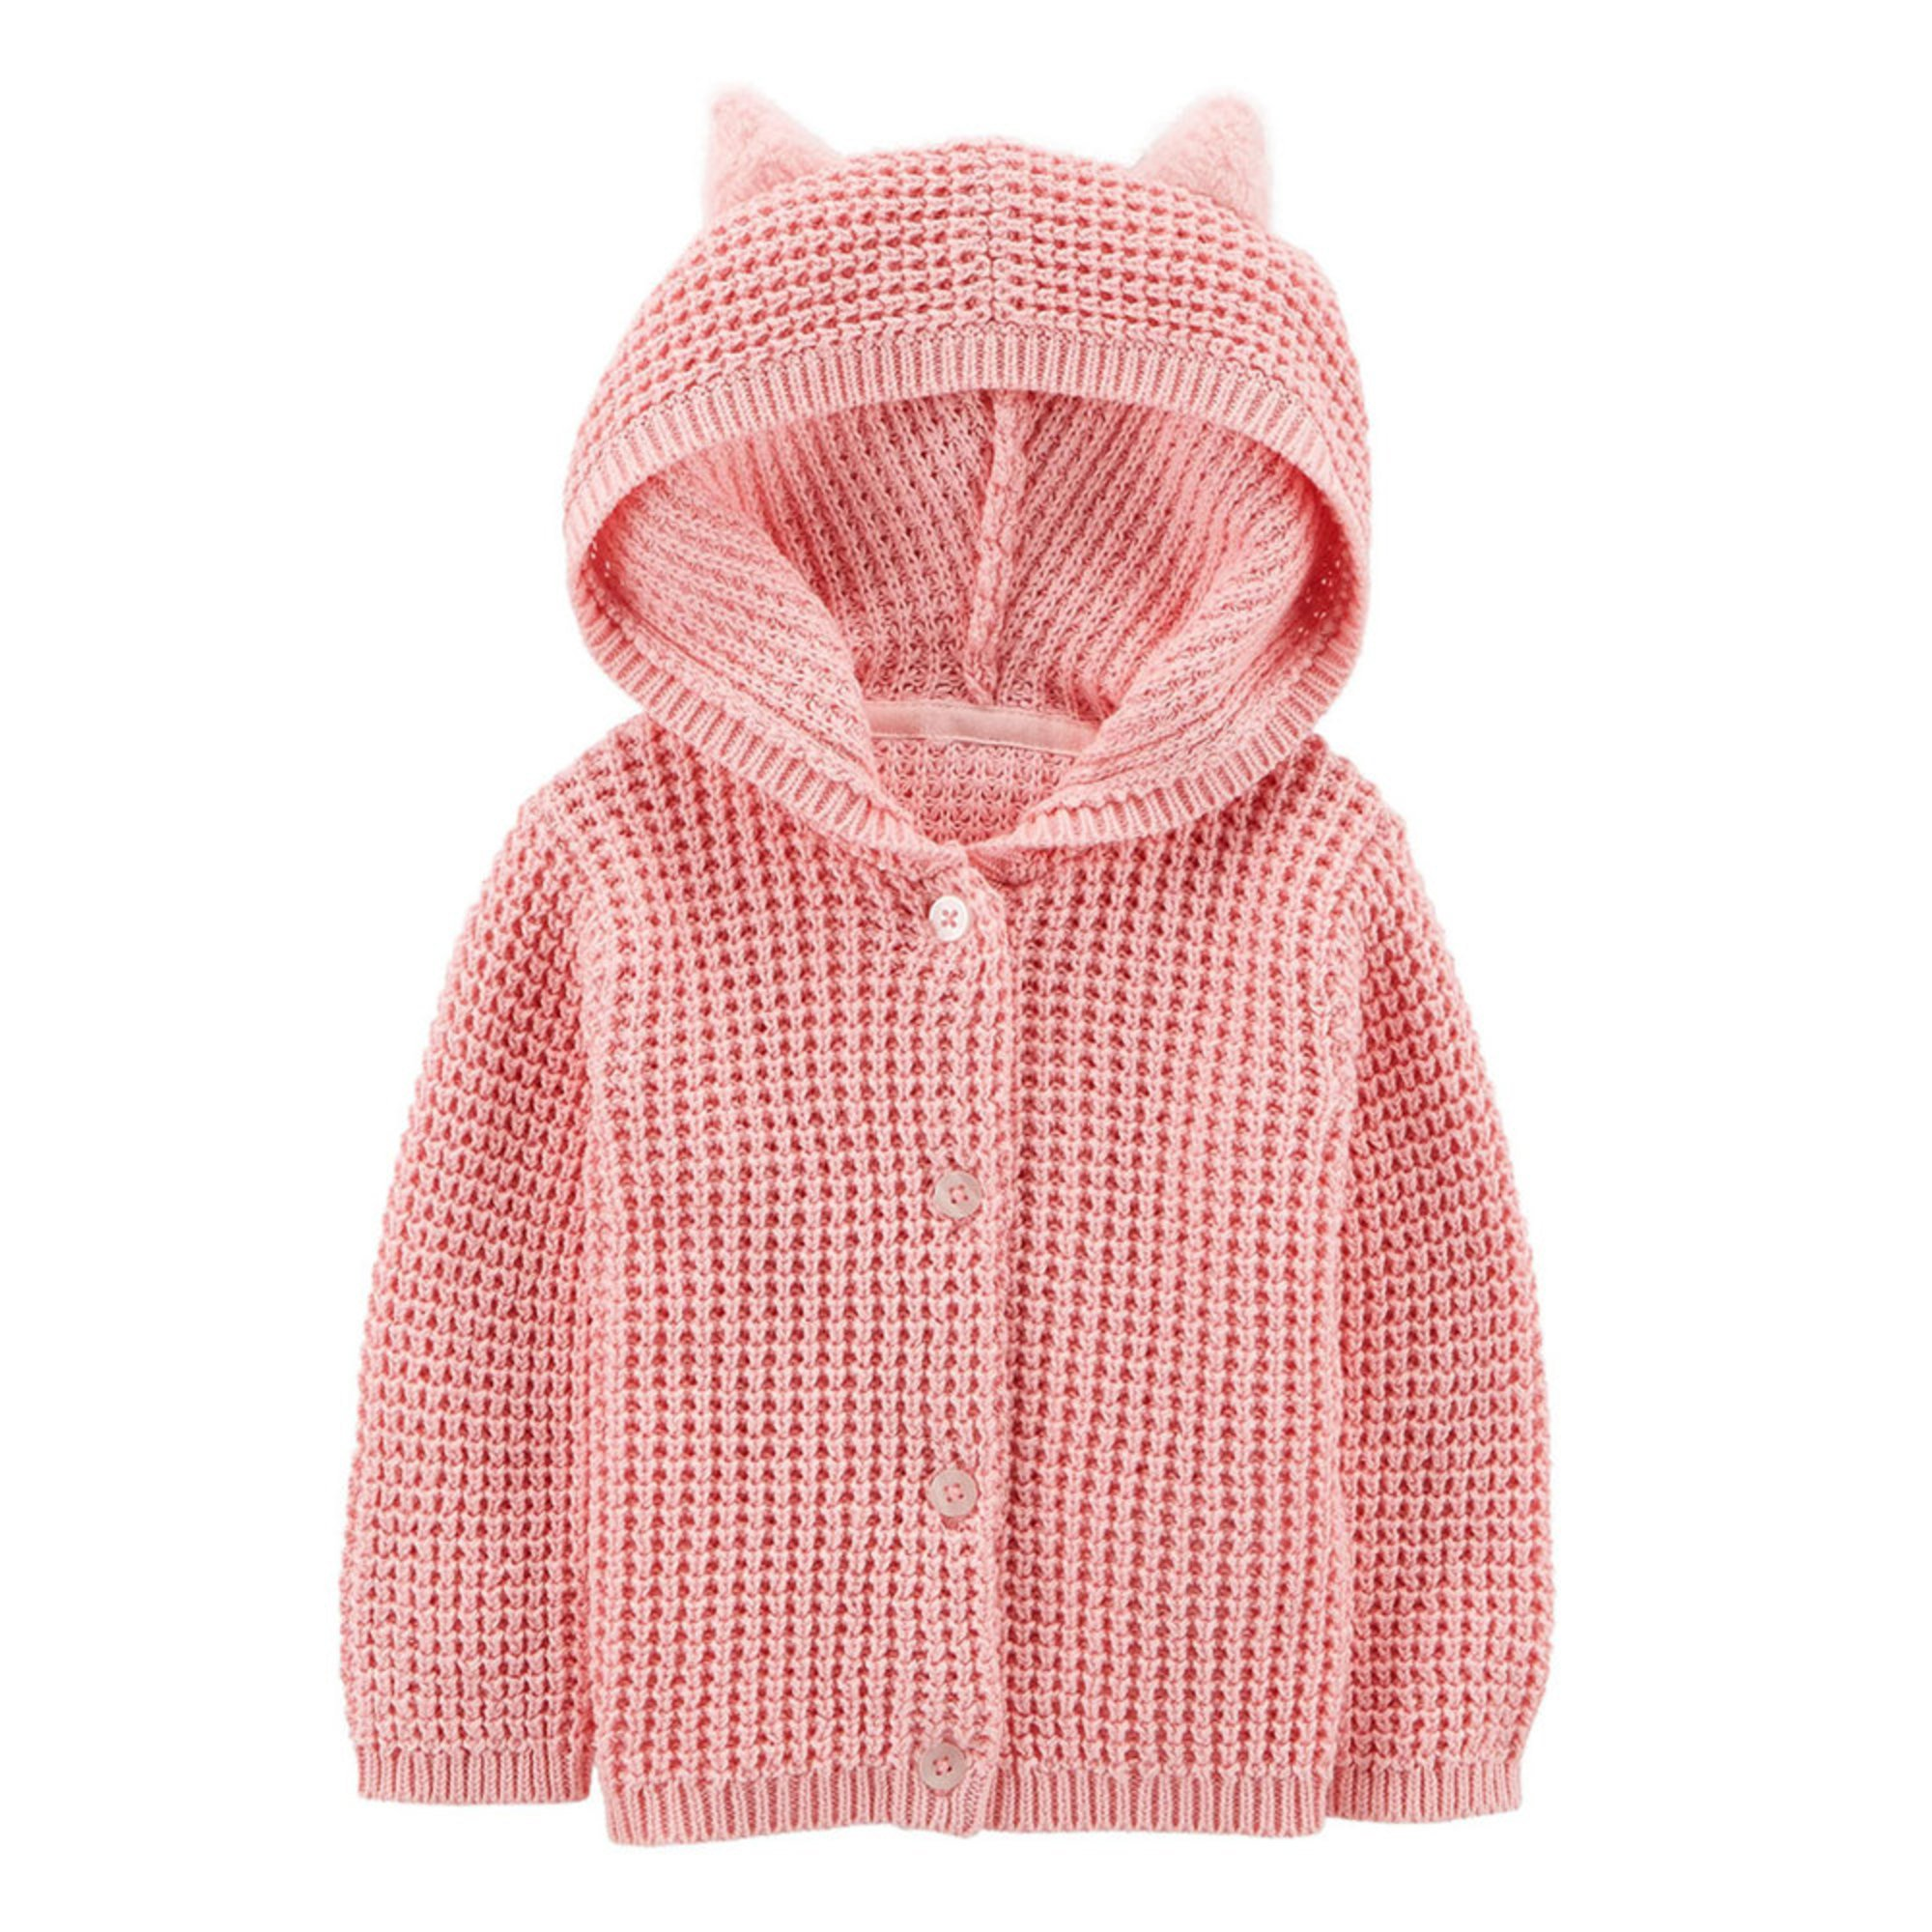 a975283b3 Carter s Baby Girls  Knit Sweater